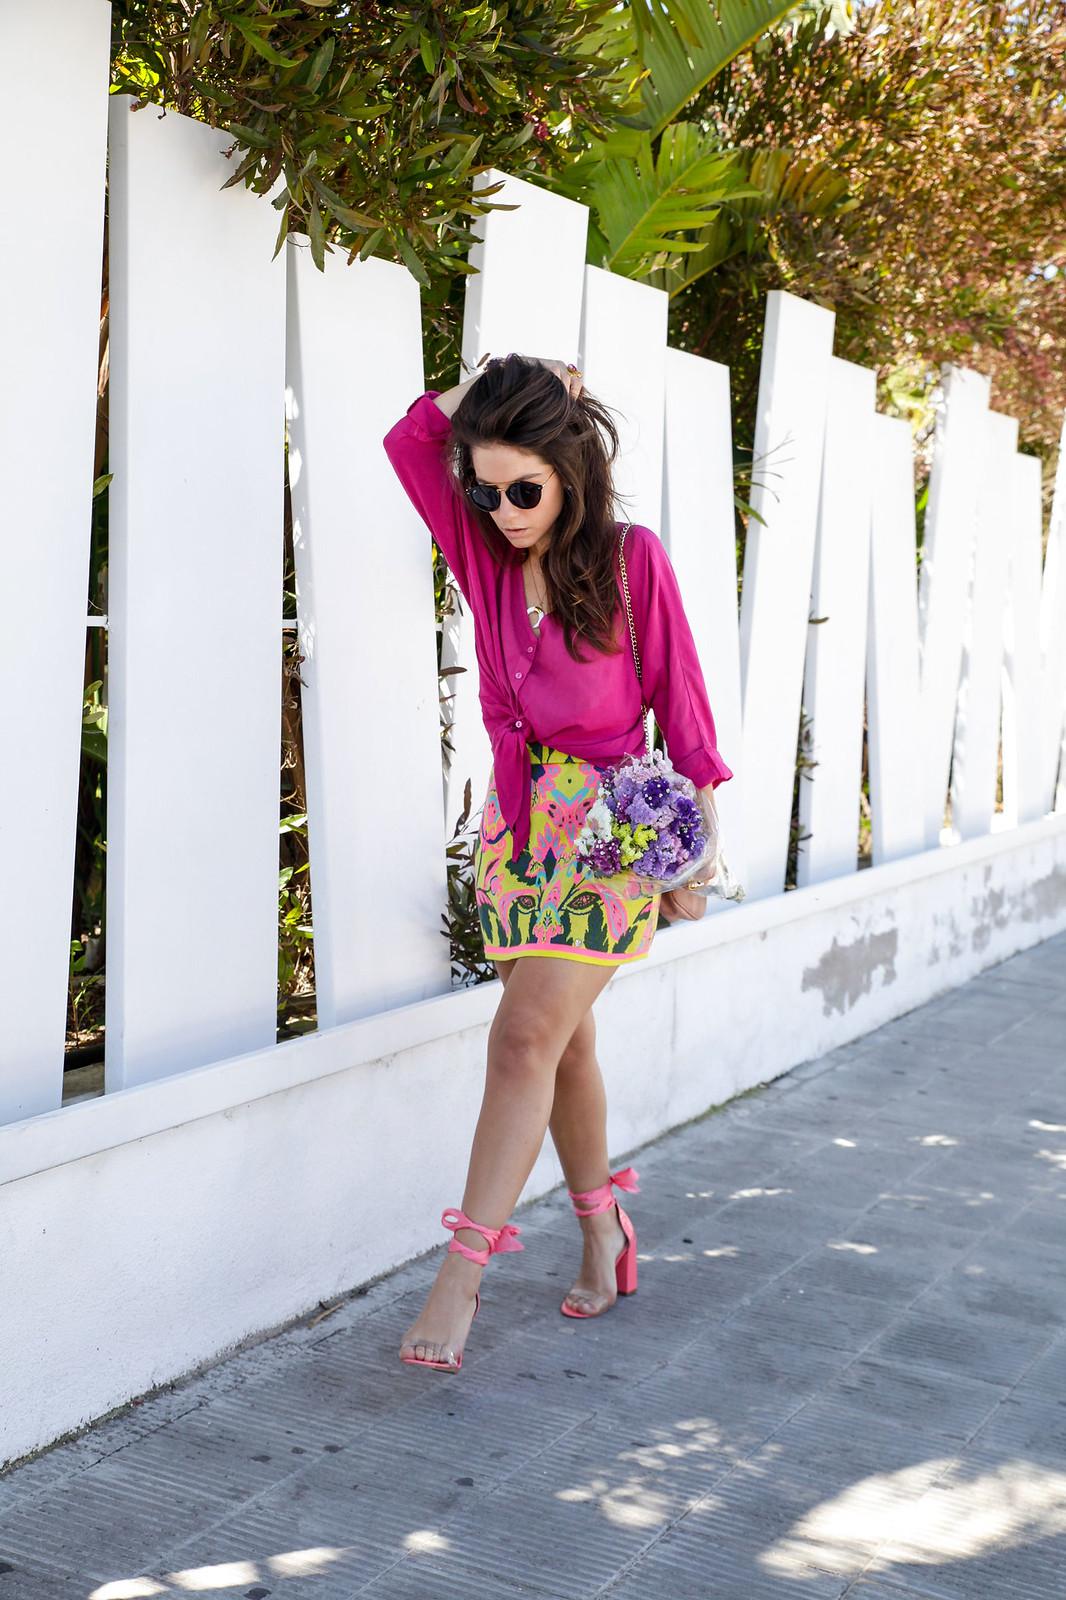 02_blusa_magenta_falda_amarilla_outfit_ruga_summer17_theguestgirl_influencer_barcelona_portugal_brand_ambassador